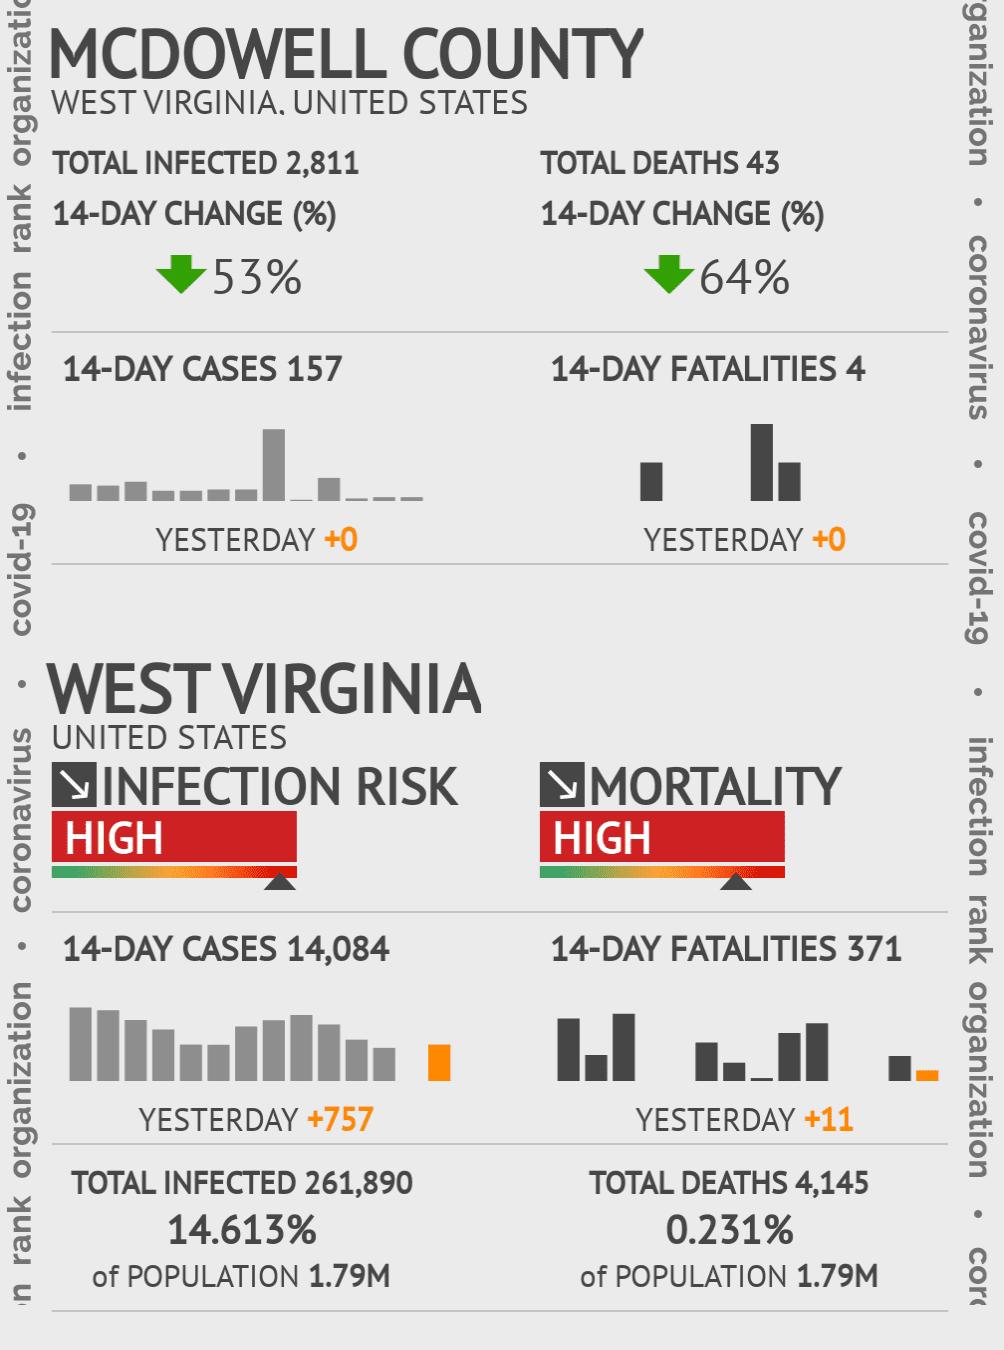 McDowell County Coronavirus Covid-19 Risk of Infection on February 25, 2021